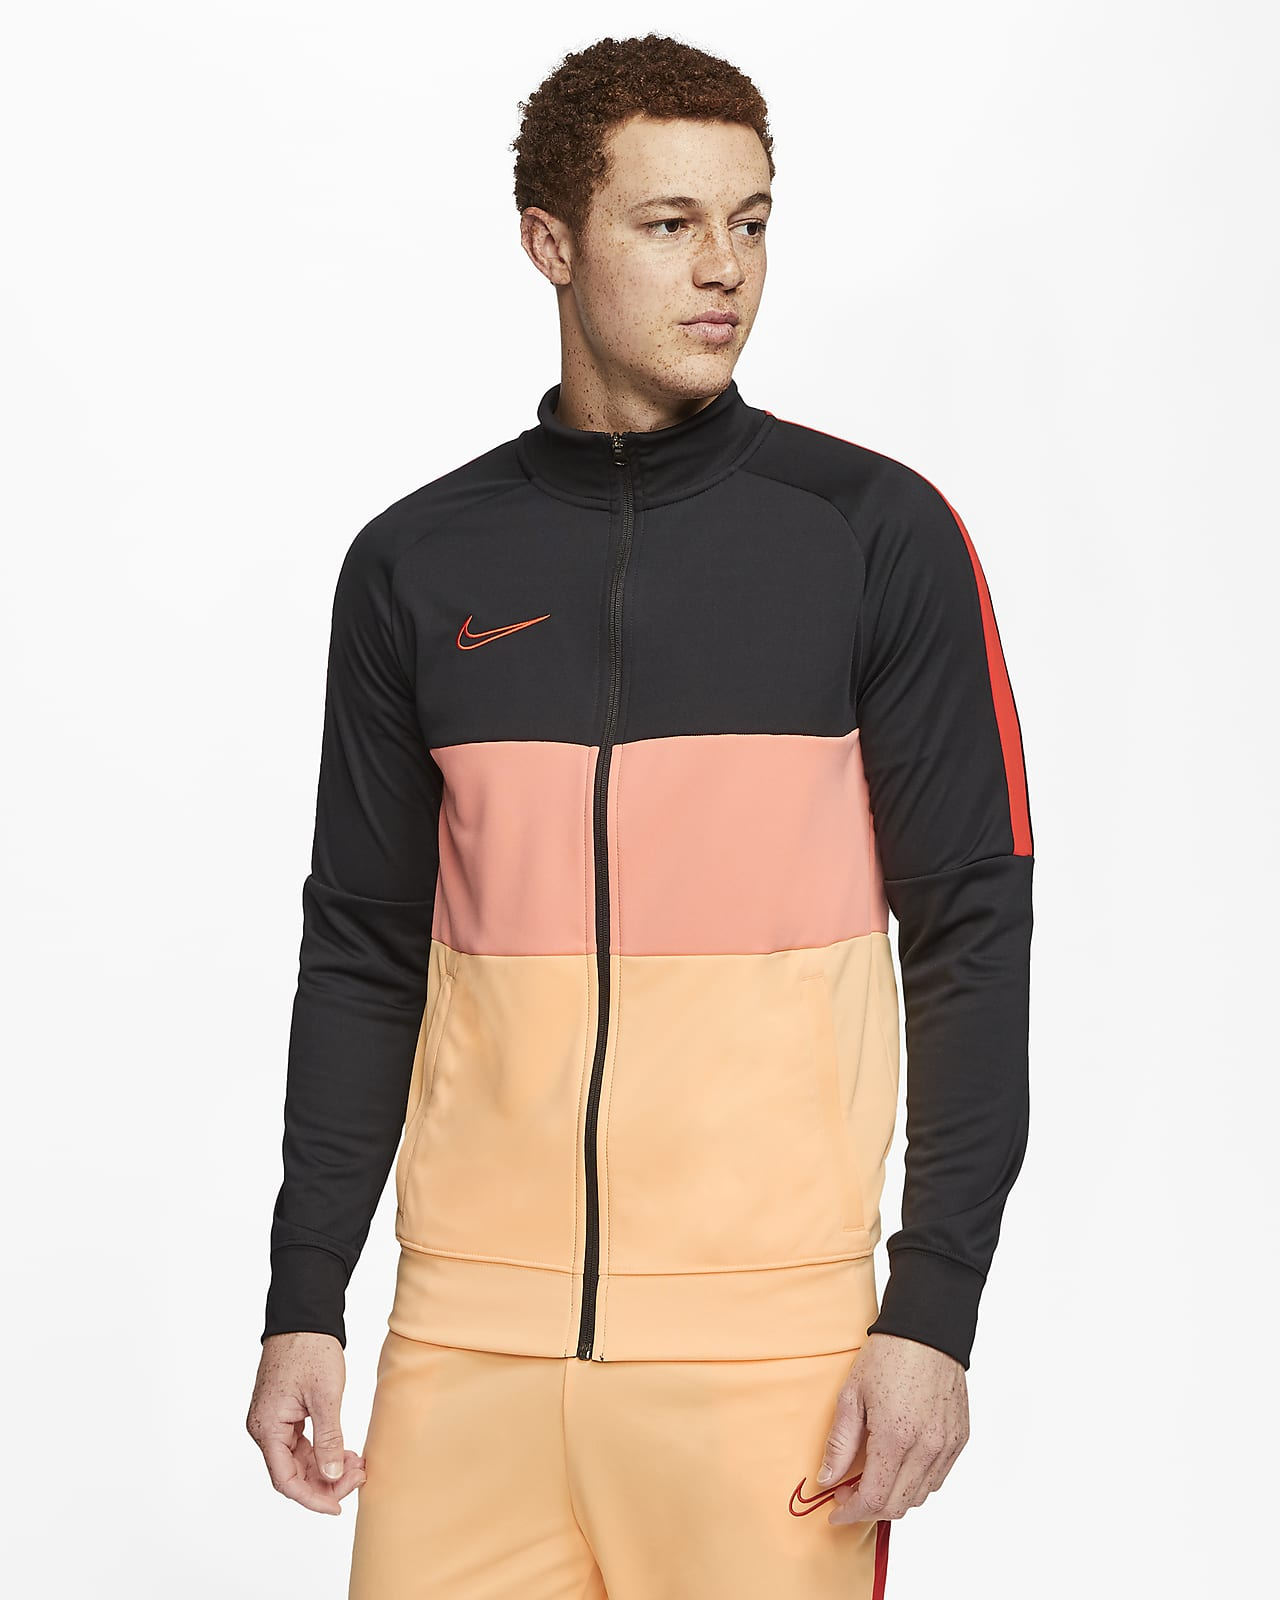 Nike Dri-FIT Academy Duitsland Voetbaljack voor heren